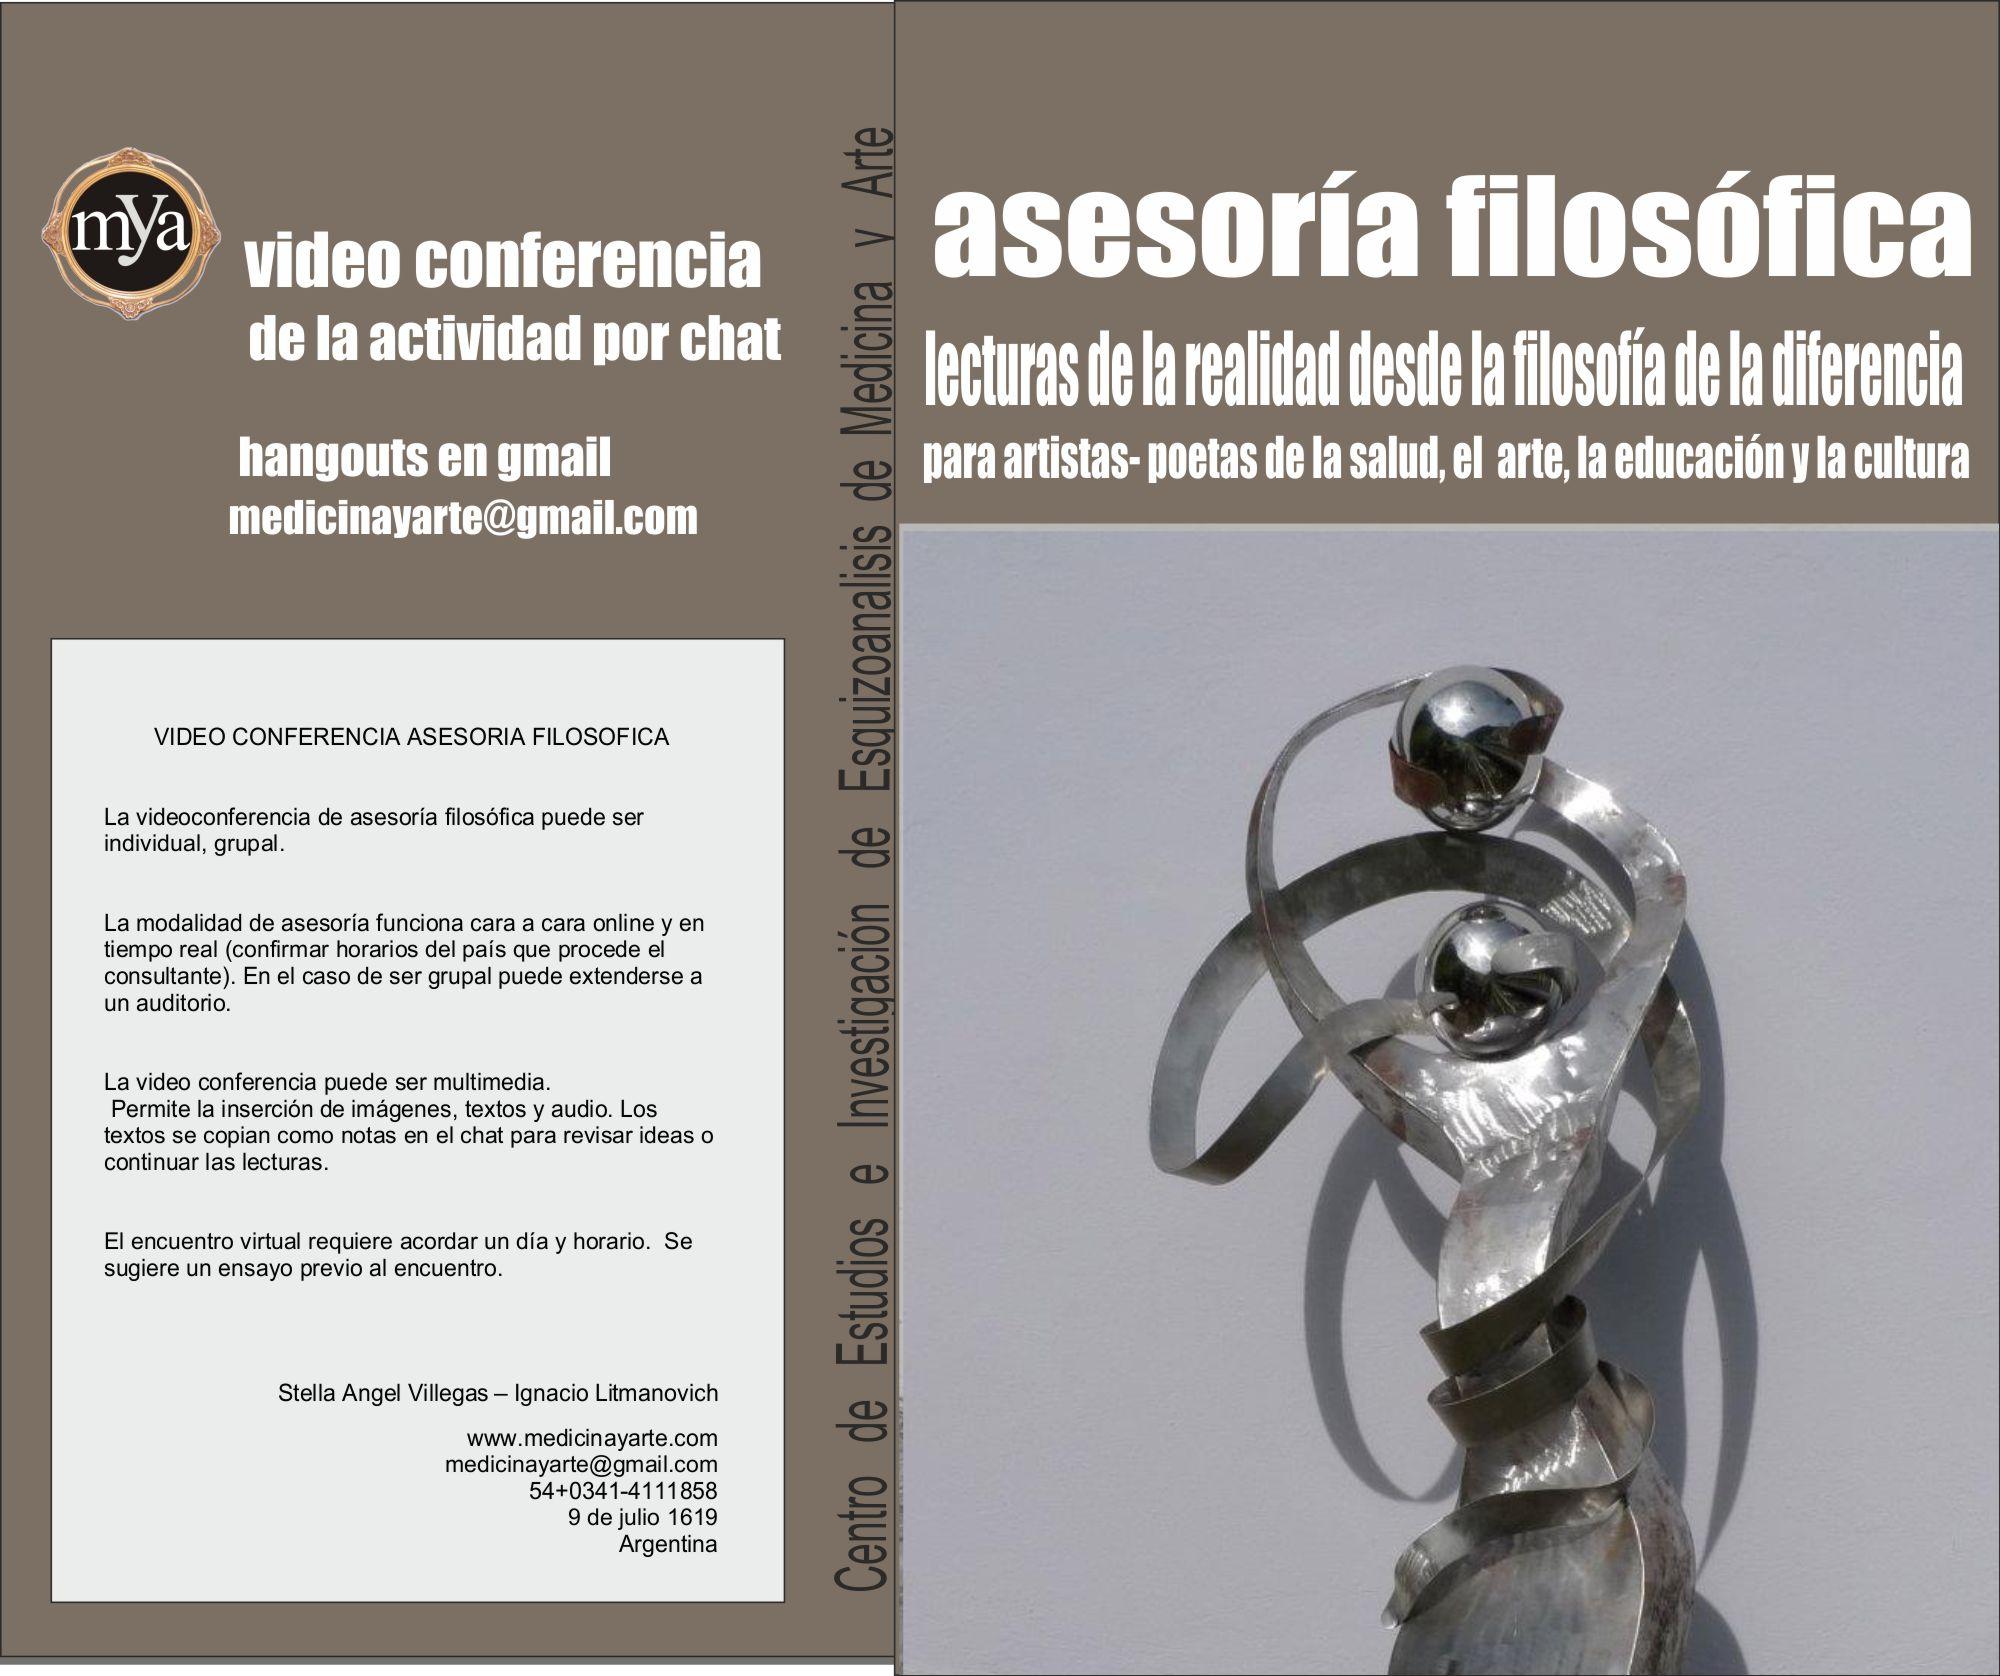 http://medicinayarte.com/img/afiche%20asesoria%20filosoficav2.jpg